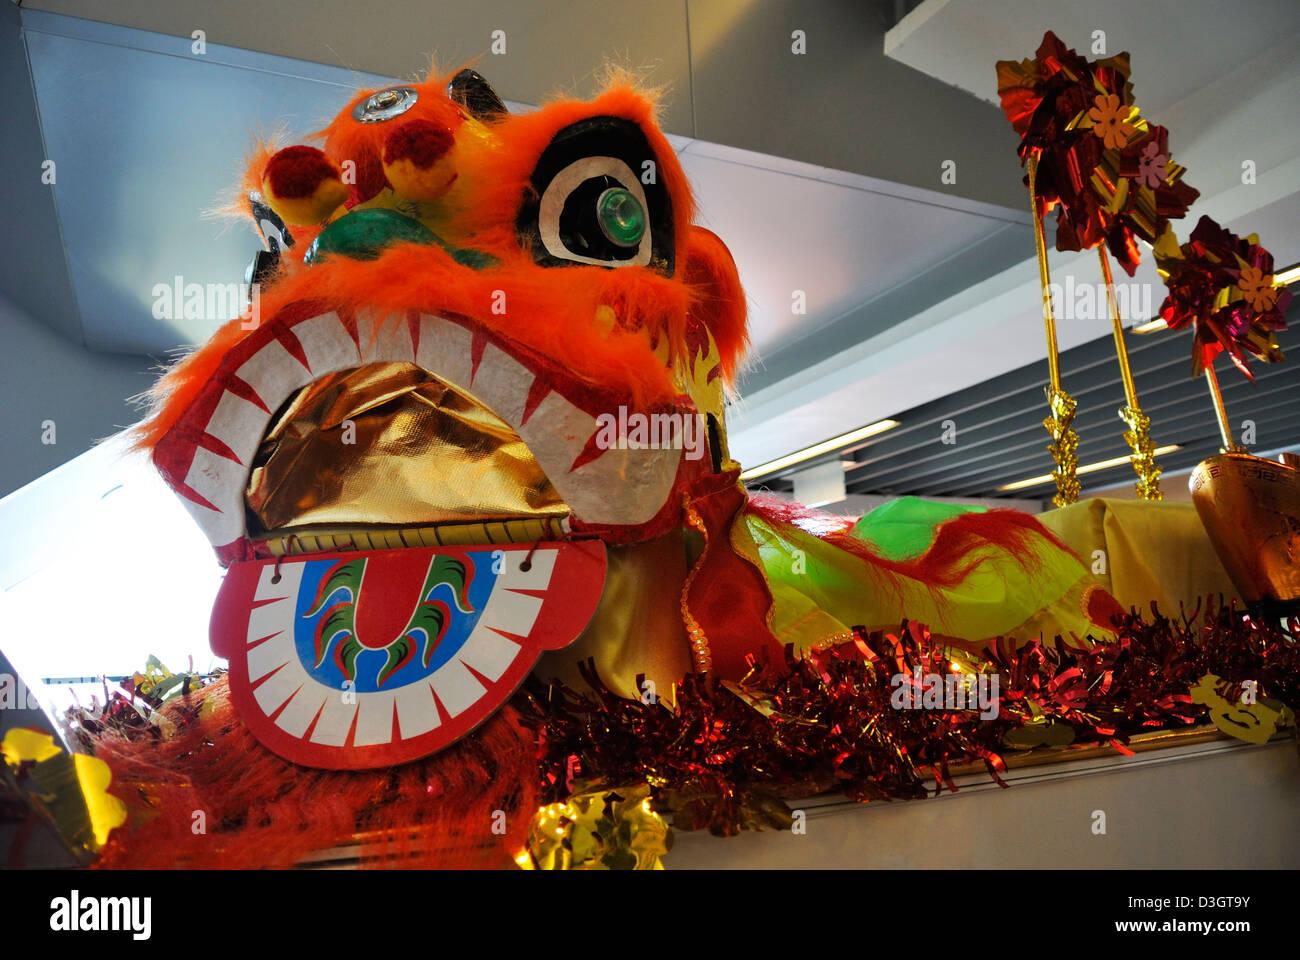 chinese new year dragon decoration at Peak Tram station, The Peak, Hong Kong, SAR, China - Stock Image